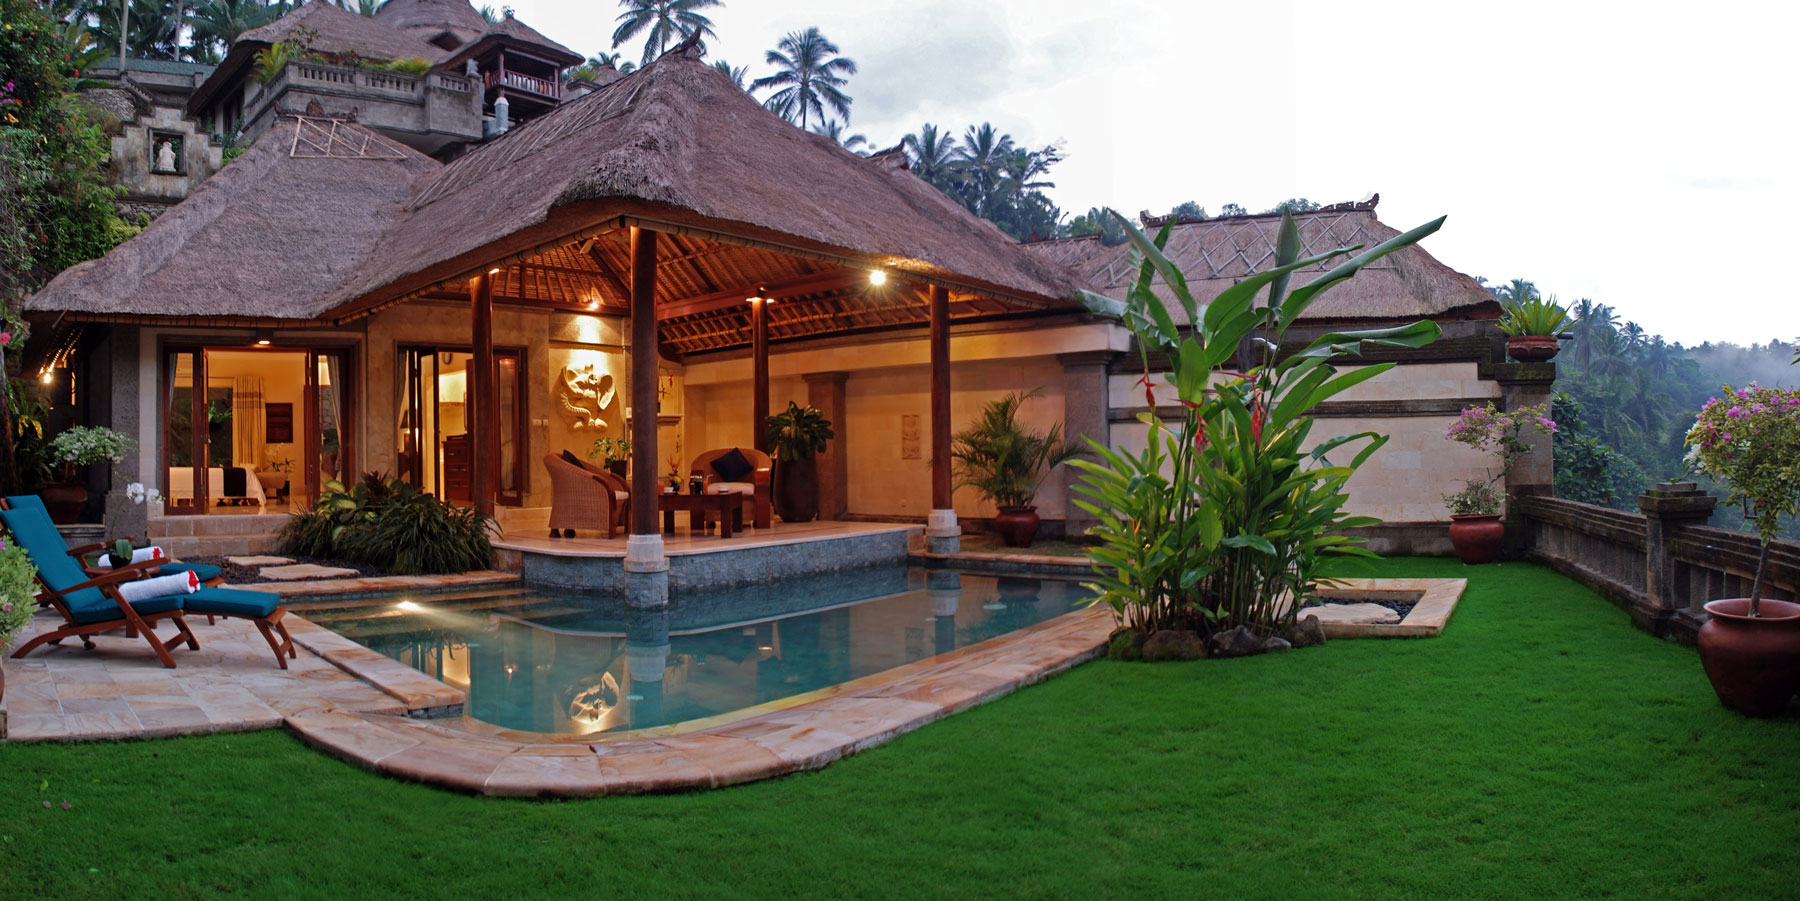 Viceroy Bali, a 5-Star Resort and Spa (22)